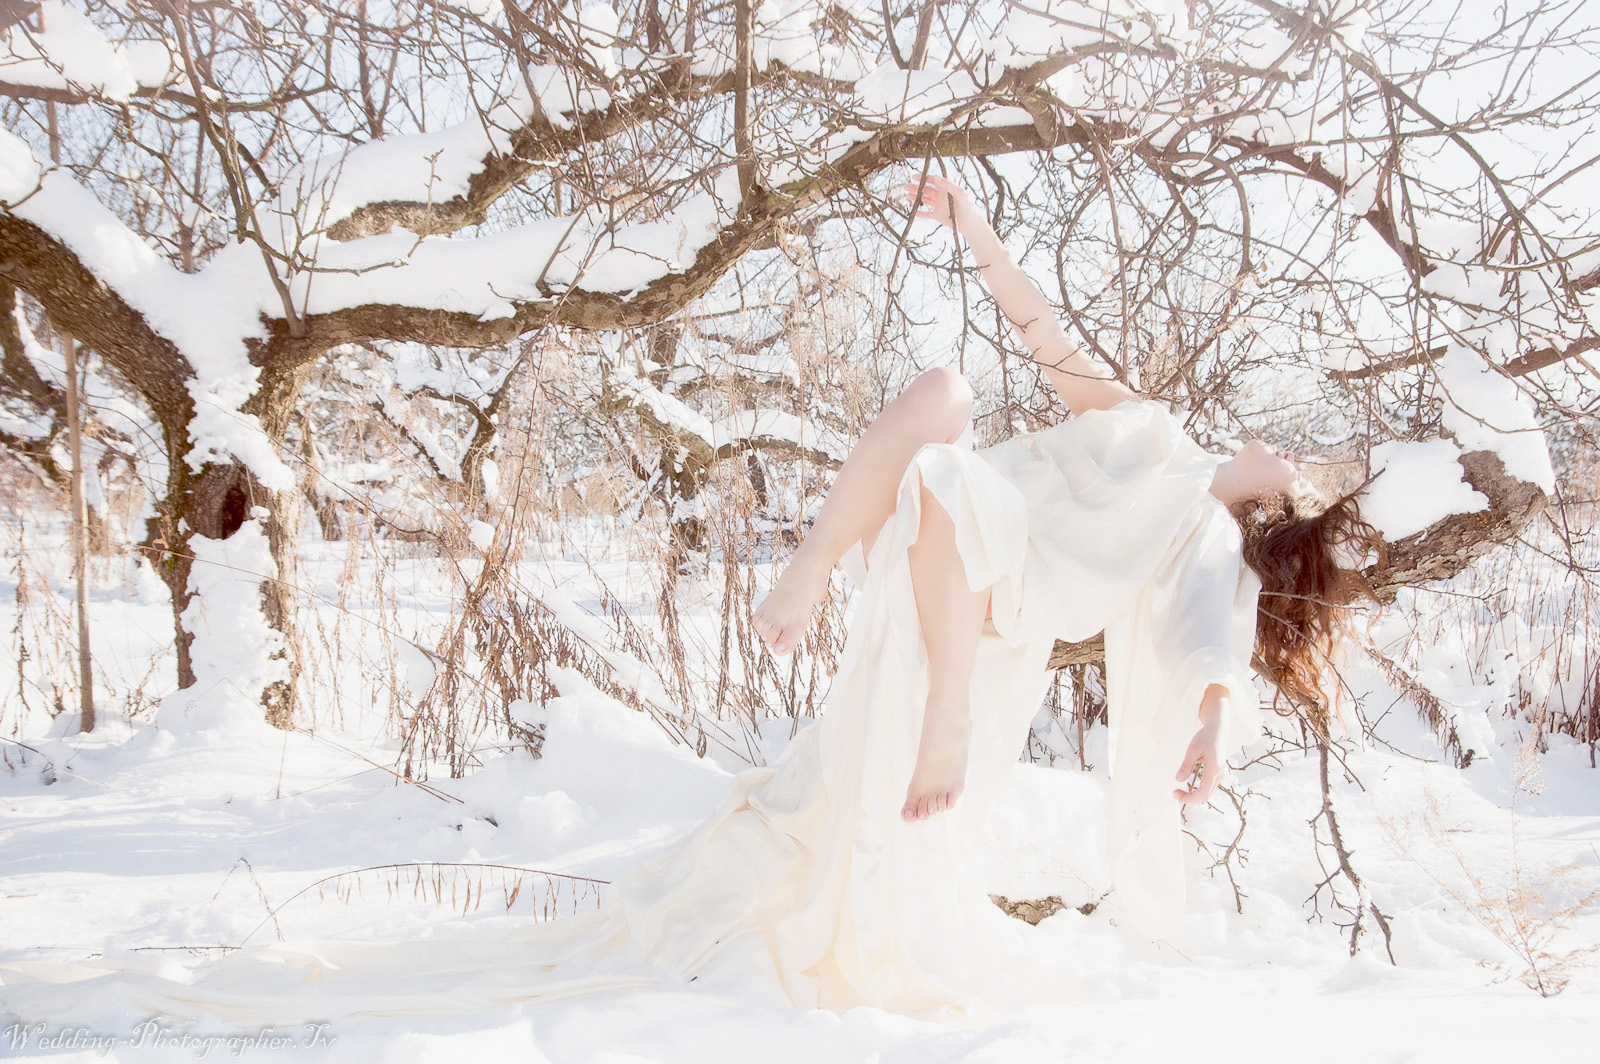 зимняя фотосессия киев